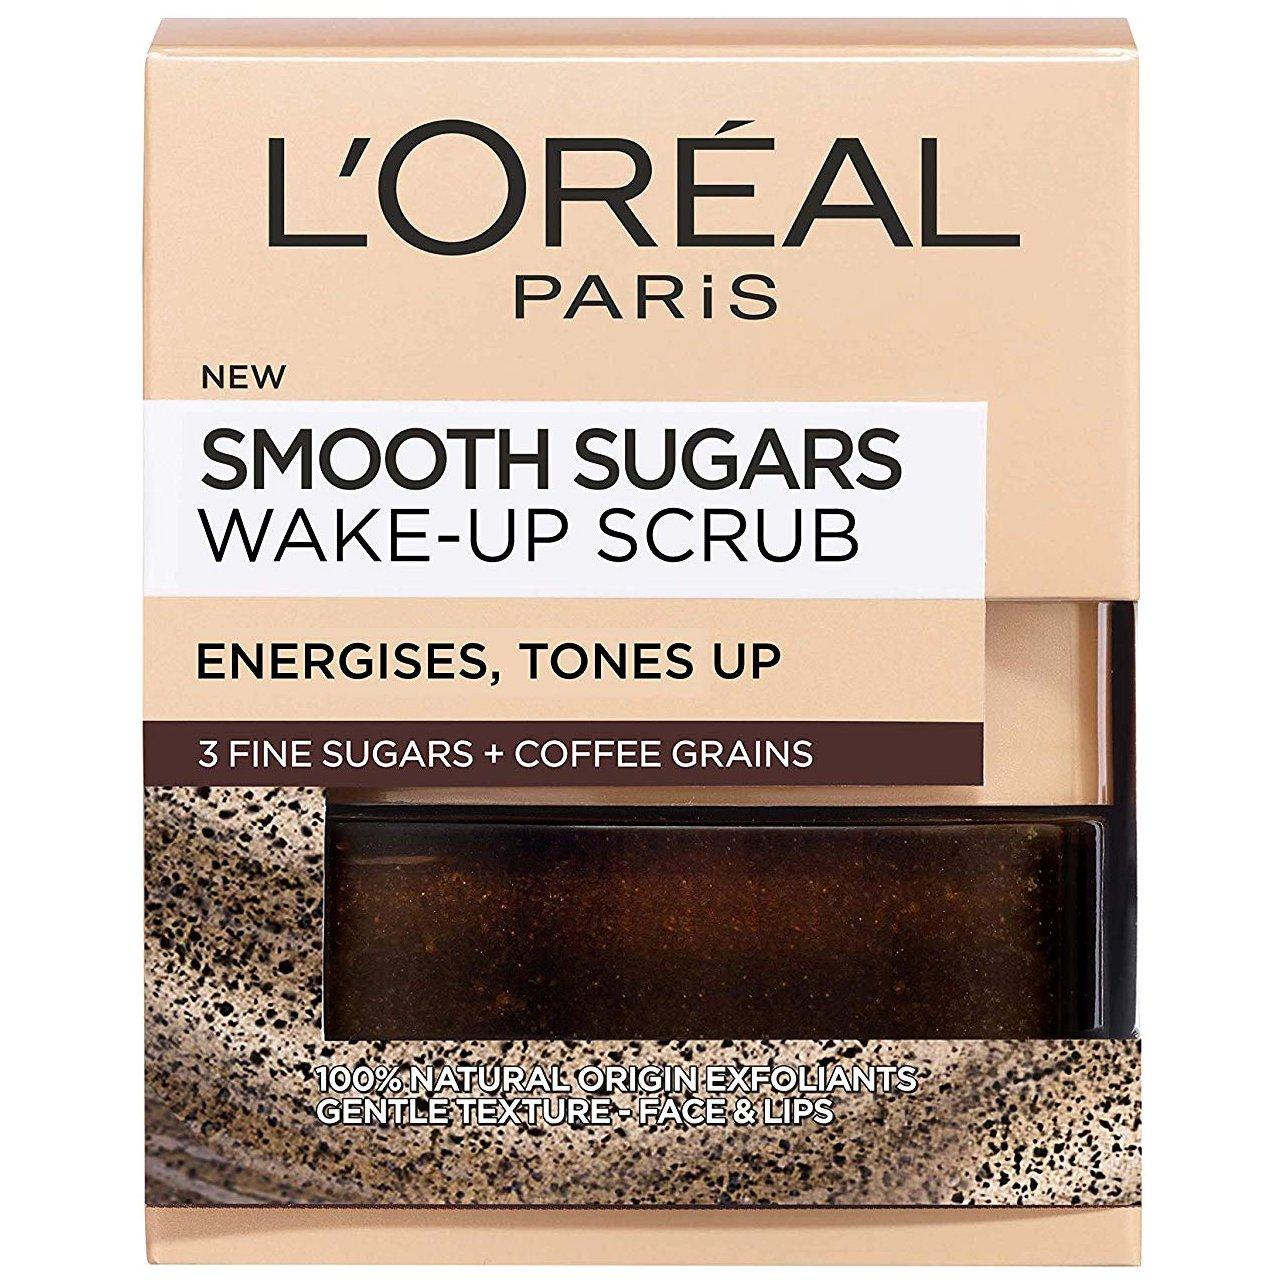 L'oreal Paris Smooth Sugars Wake-Up Scrub για Ξεκούραστη & Φρέσκια Επιδερμίδα 50ml